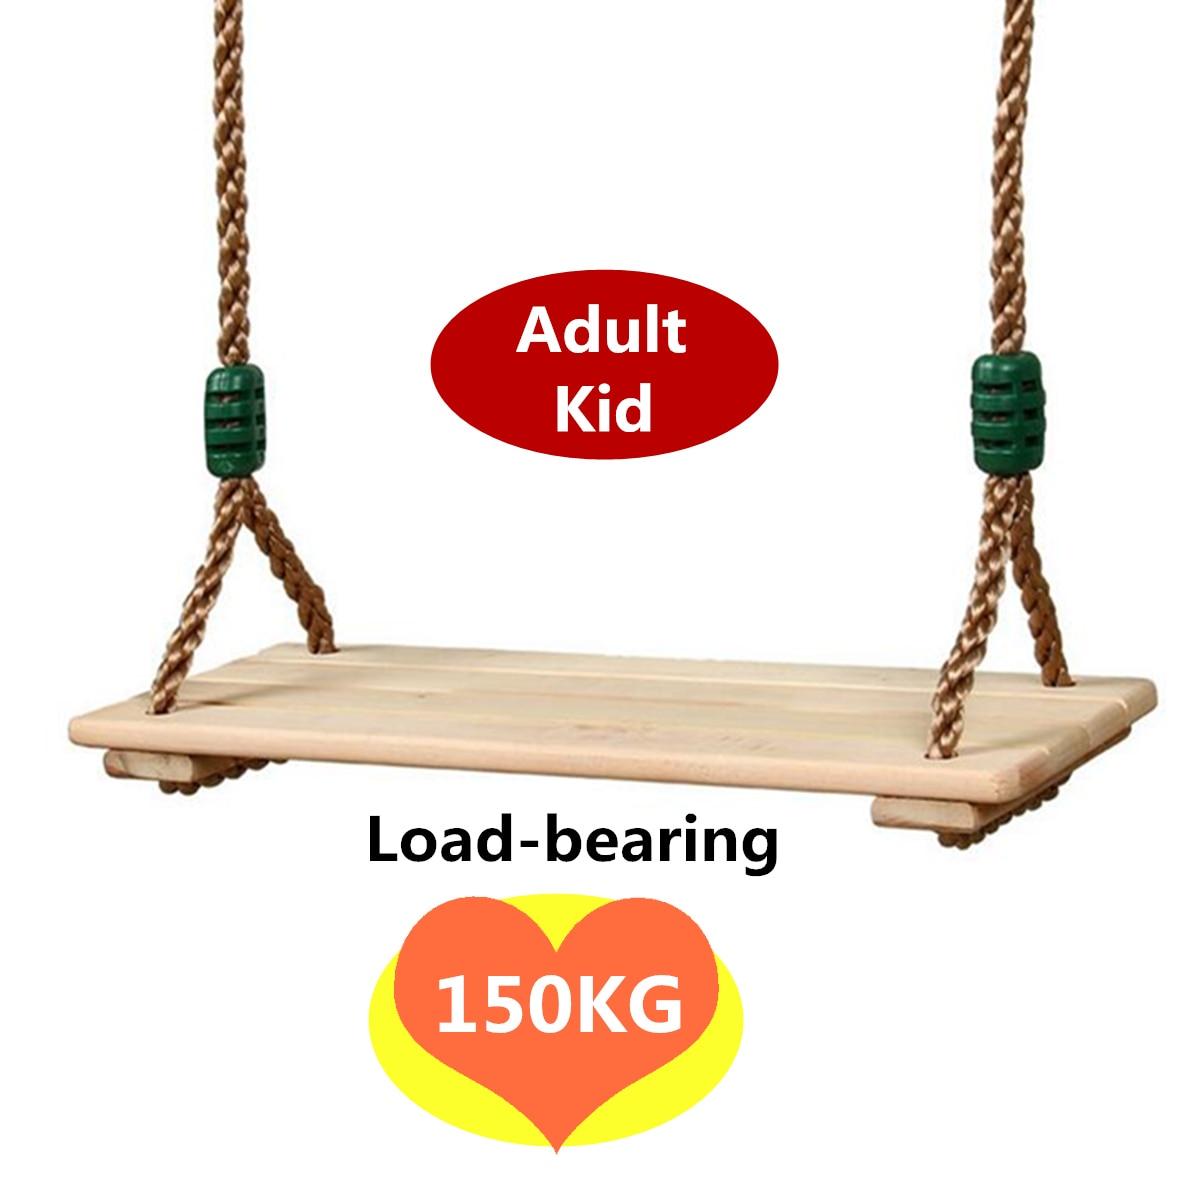 Adults and children Swing Wooden Toy Swing with Rope Toys Kids Indoor Outdoor Playhouse Wooden Children Outdoor Garden Swings